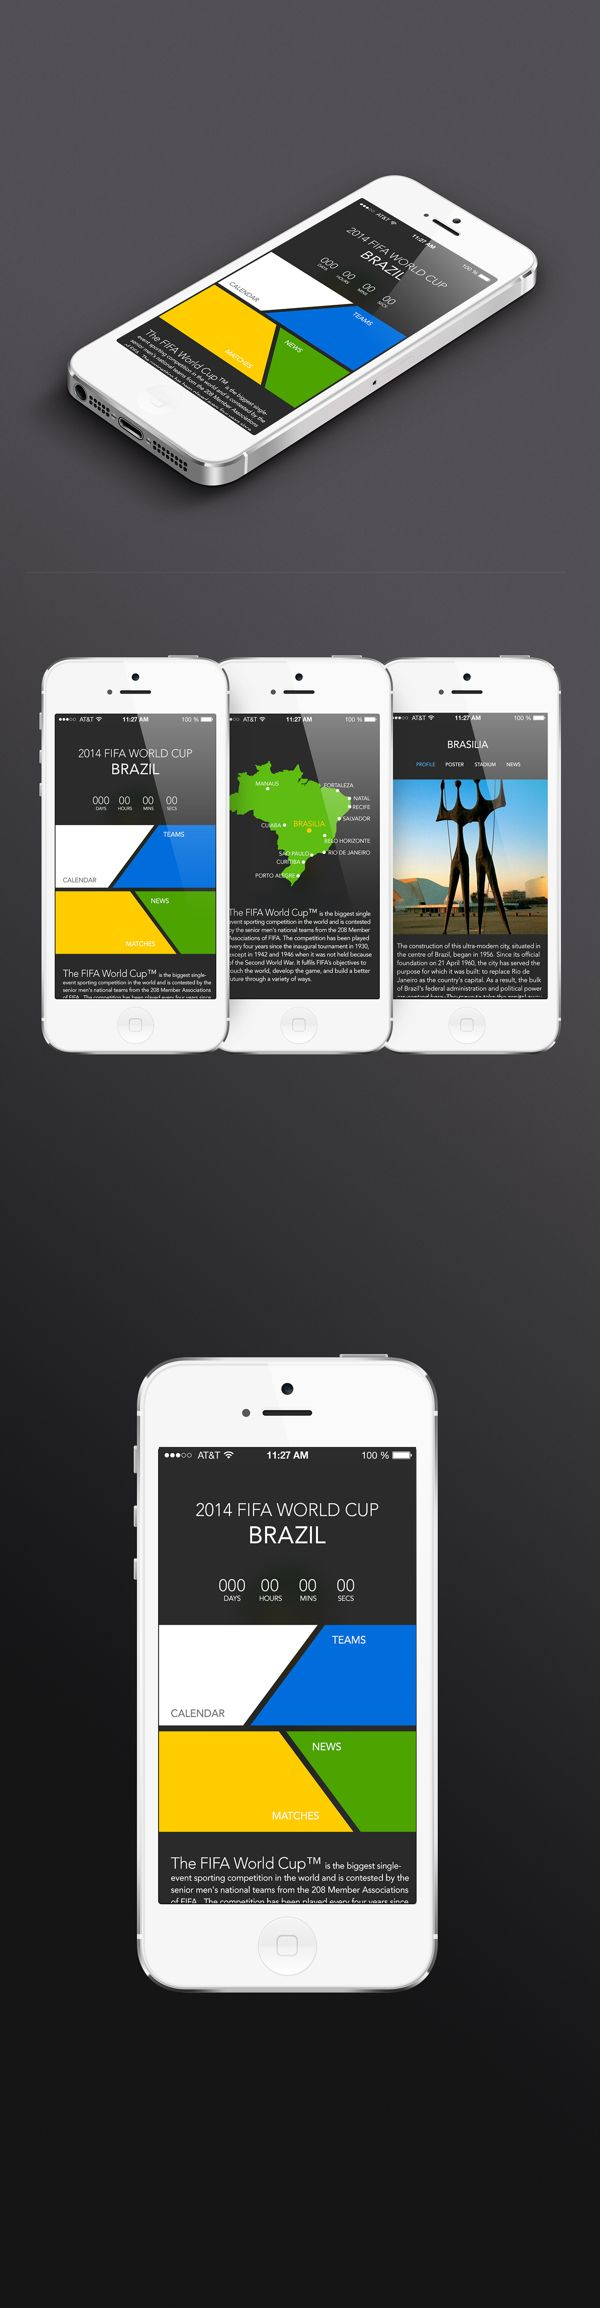 2014 brazil world cup iphone app user interface.  #brazil #worldcup #iphone #ui #nikhil